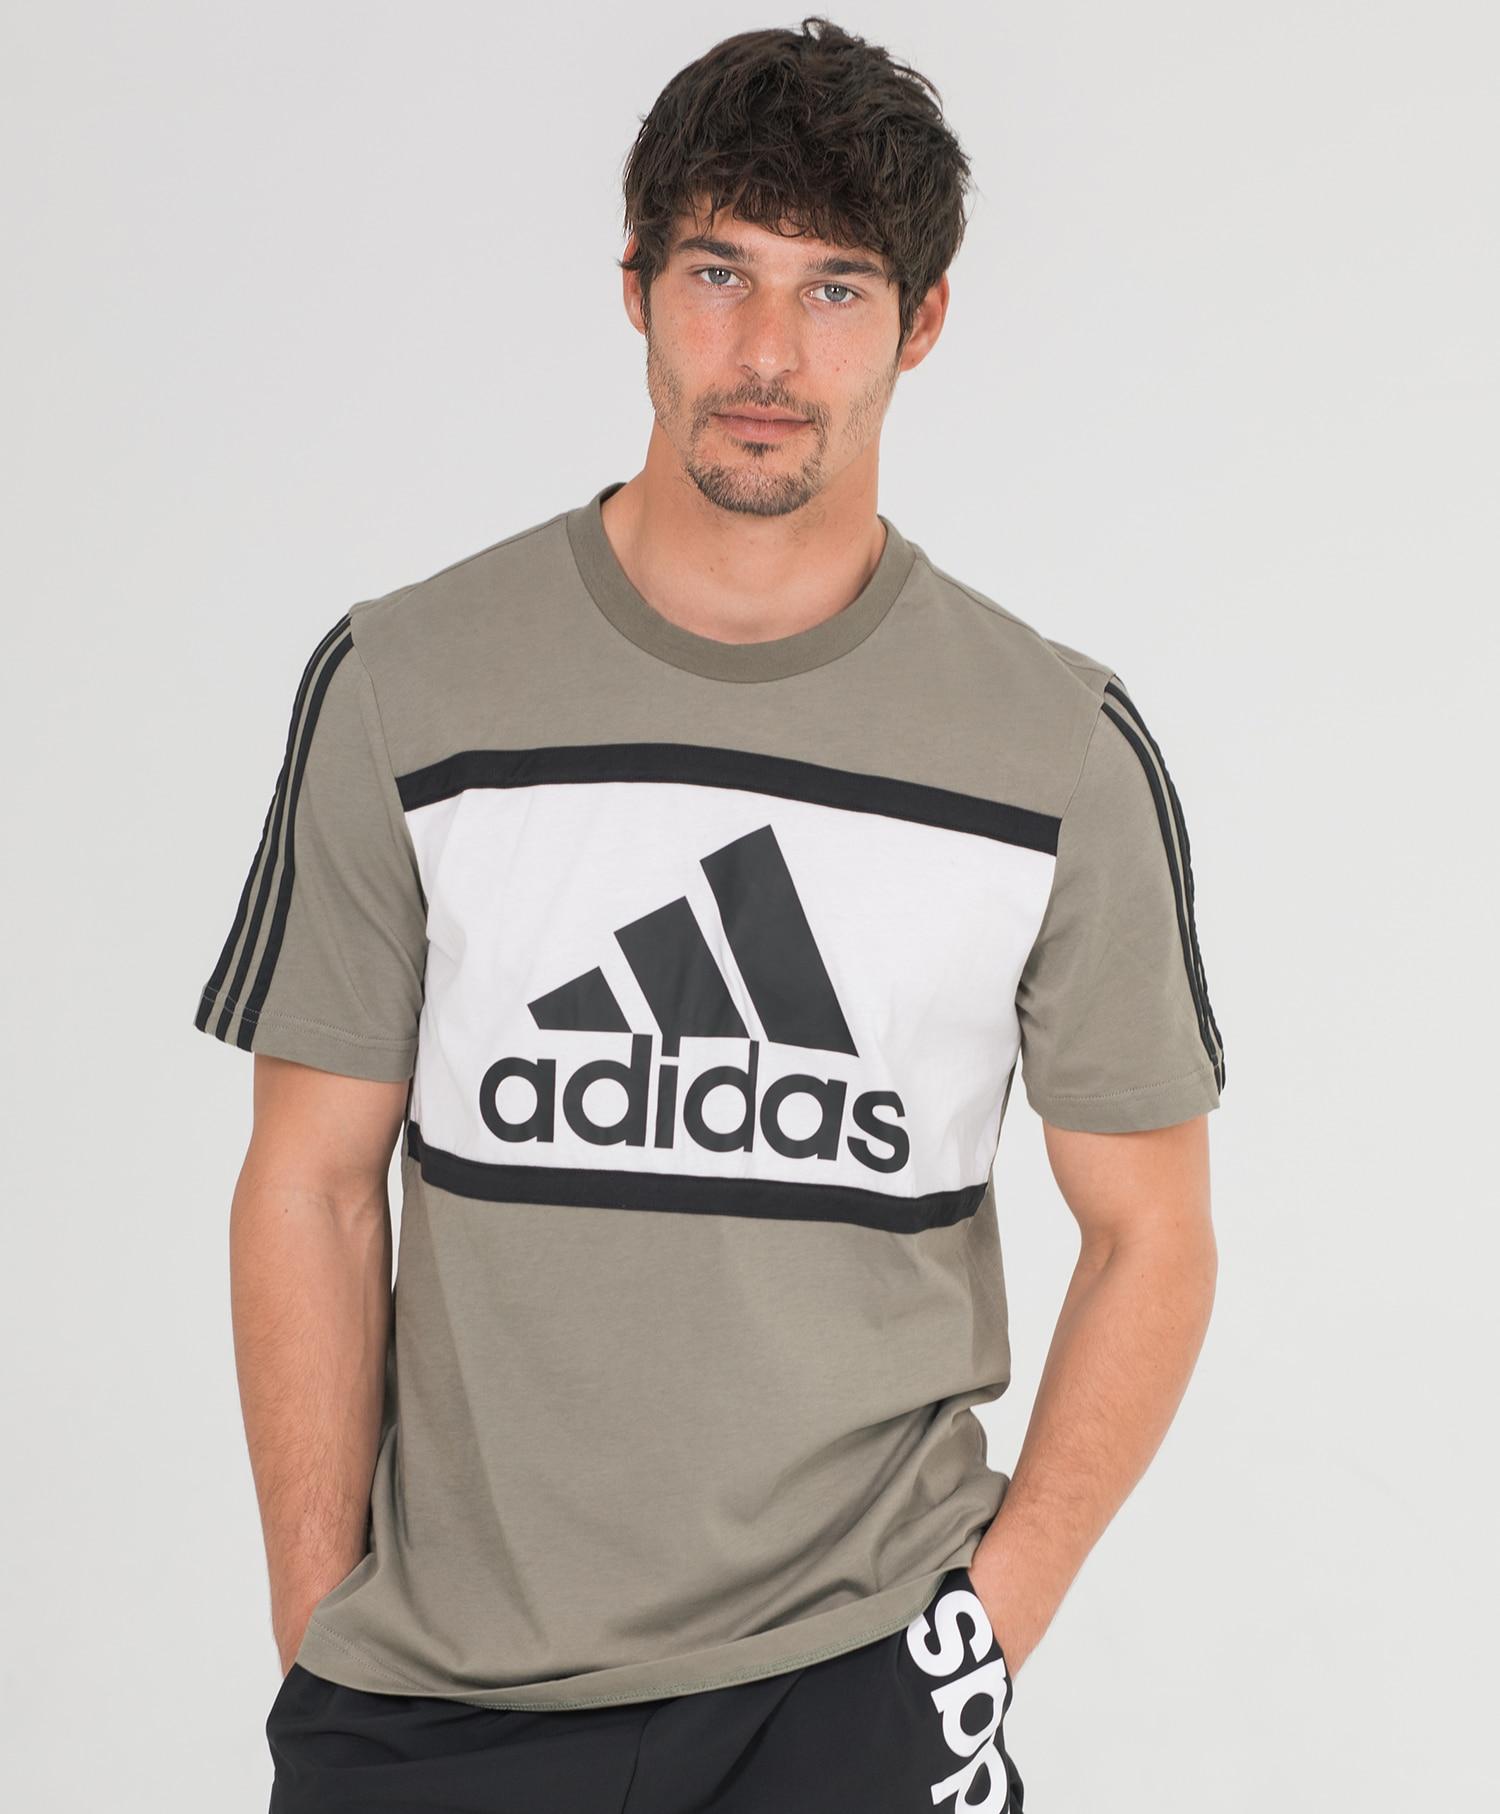 Adidas cb t TEE